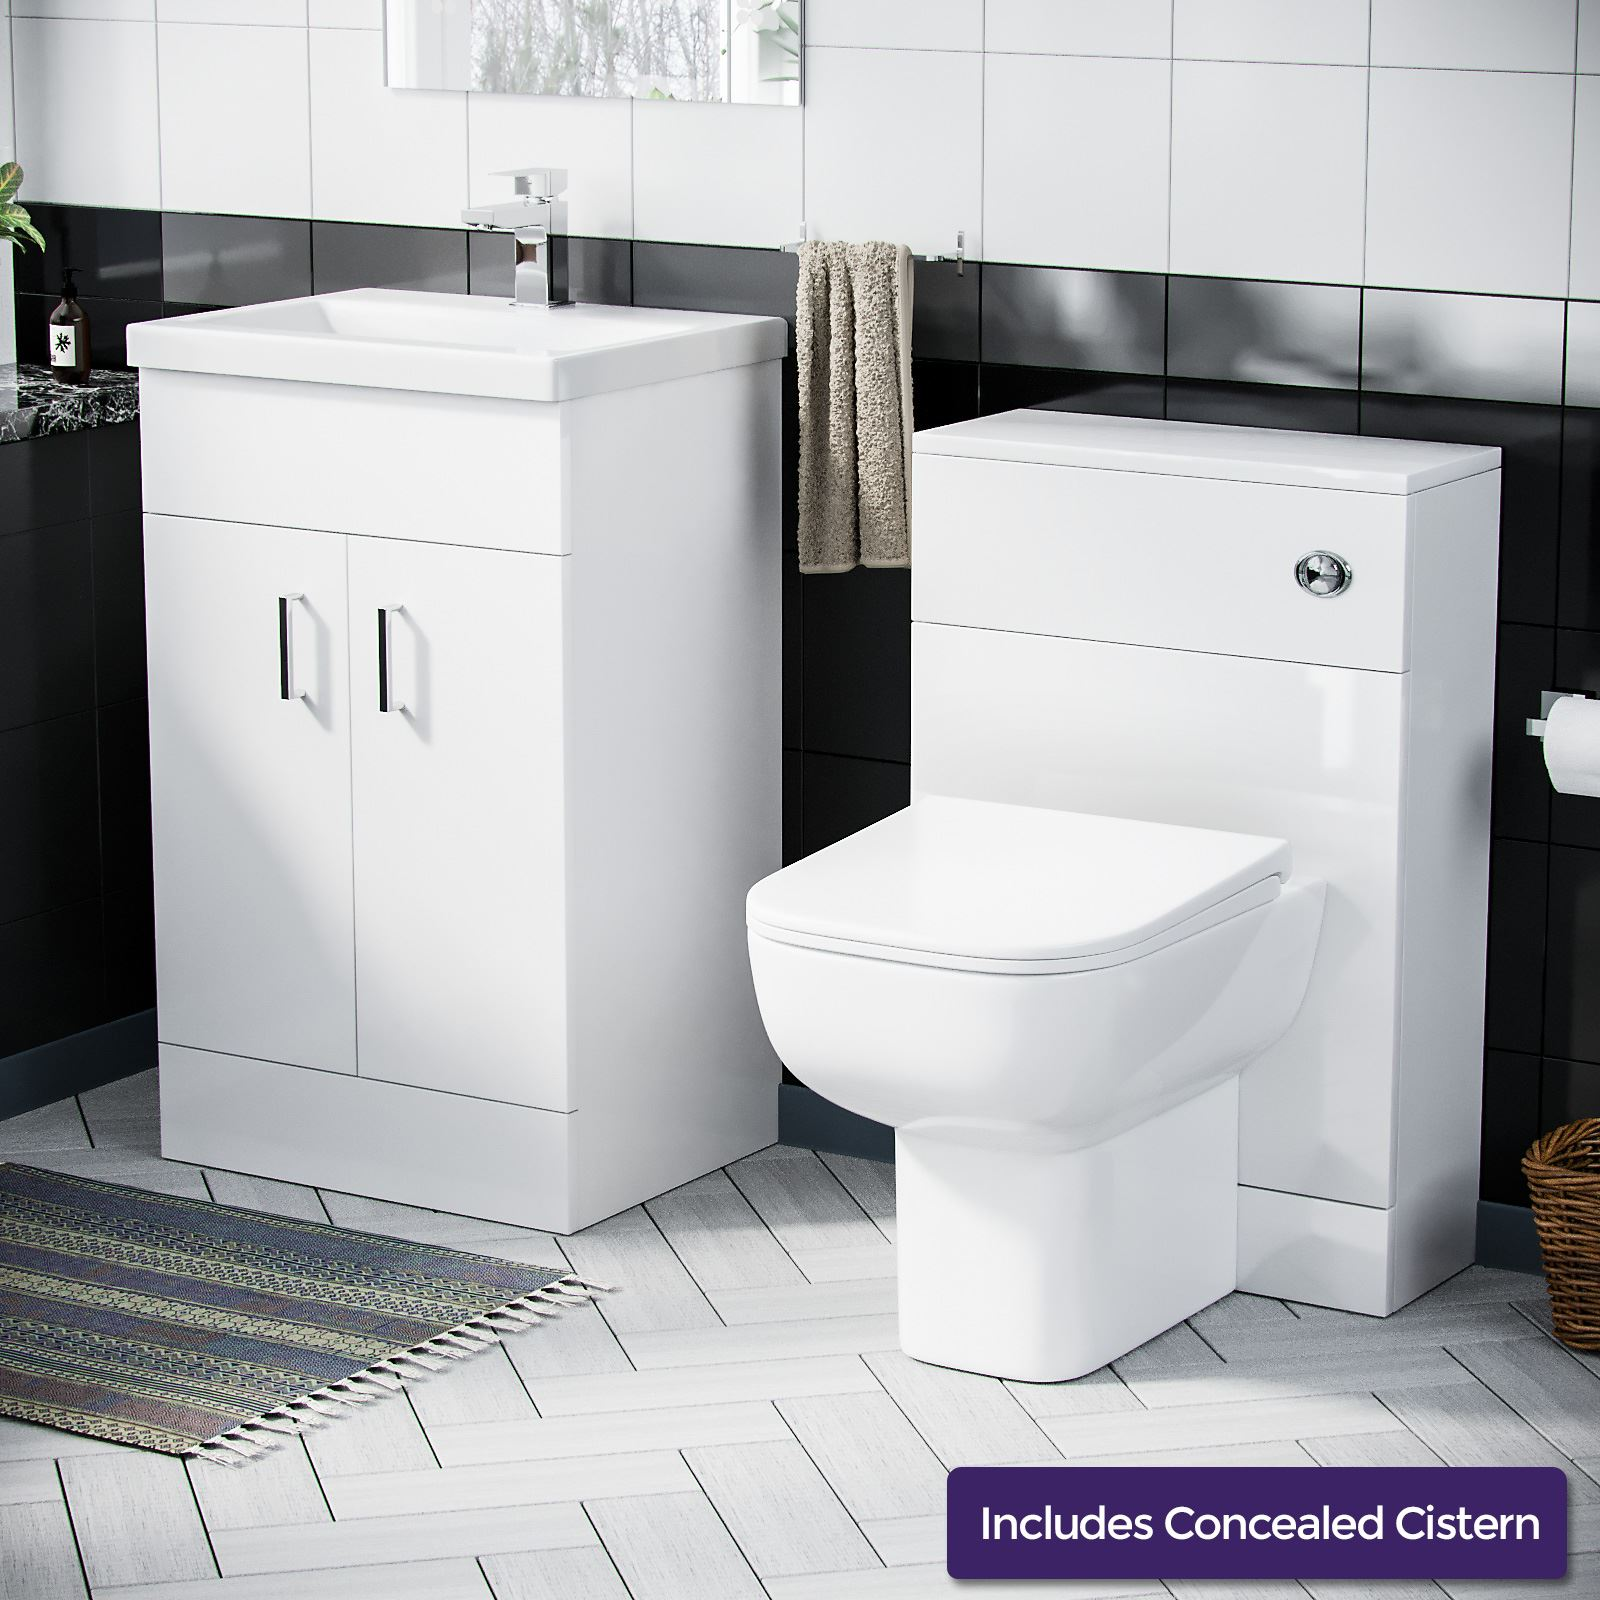 500 Mm Basin Sink Vanity Unit Wc Toilet Pan Cistern Cabinet Suite Ingersly Ebay